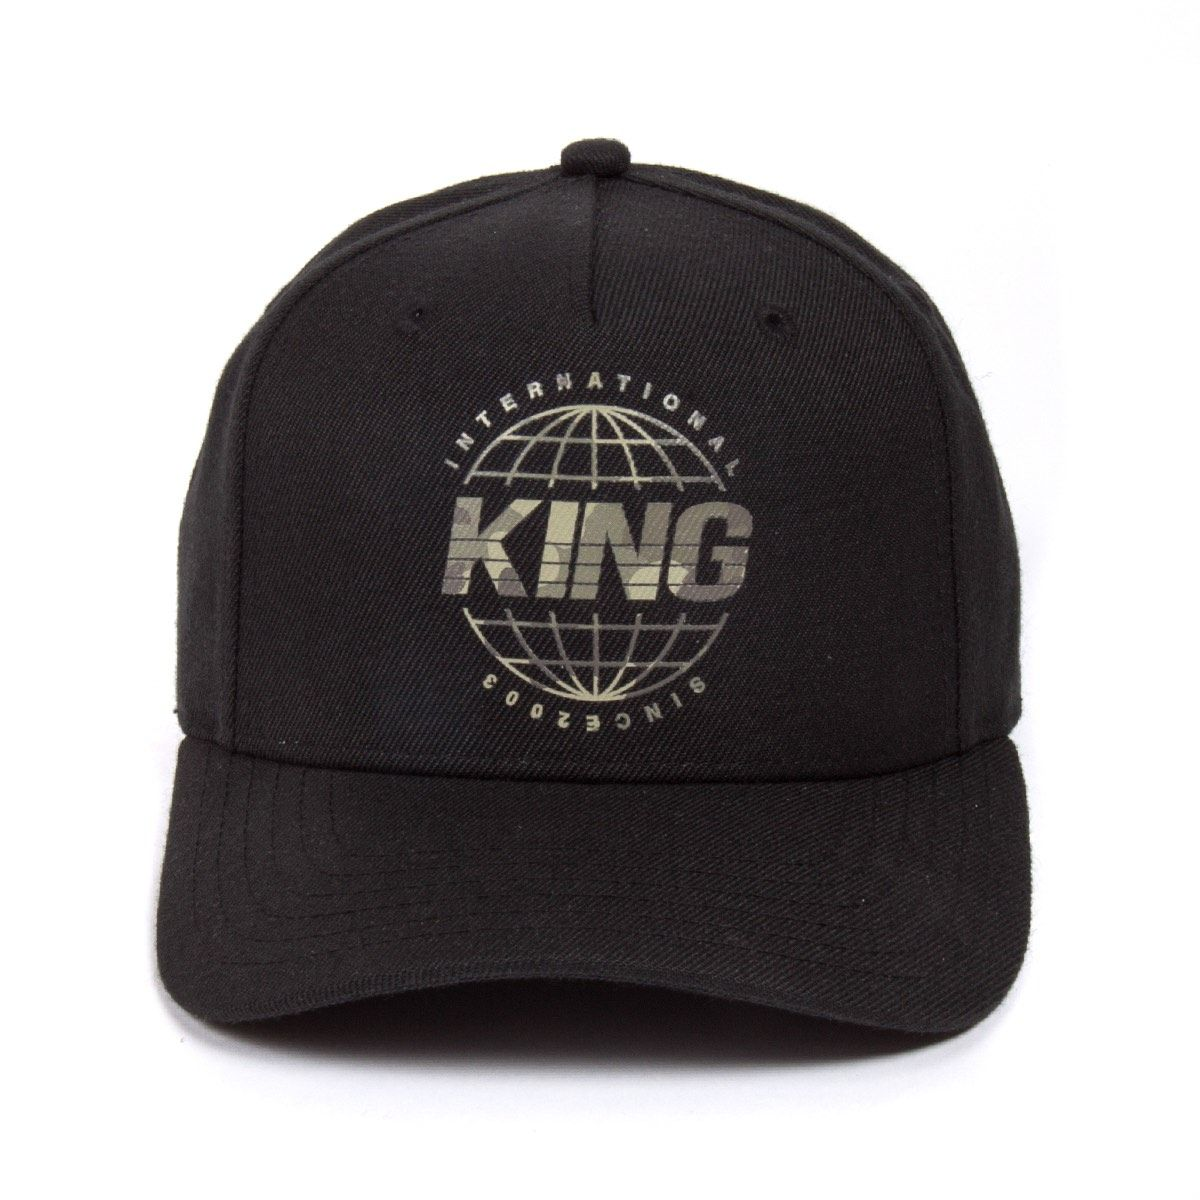 Grab this King Apparel Bethnal Curved Peak Black Snapback Hat! Go get it now at . #king #kingapparel #bethnal #london #england #logo #snapback #hat #cap #black #swag #me #style #tagsforlikes #me #swagger #jacket #shirt #dope #fresh